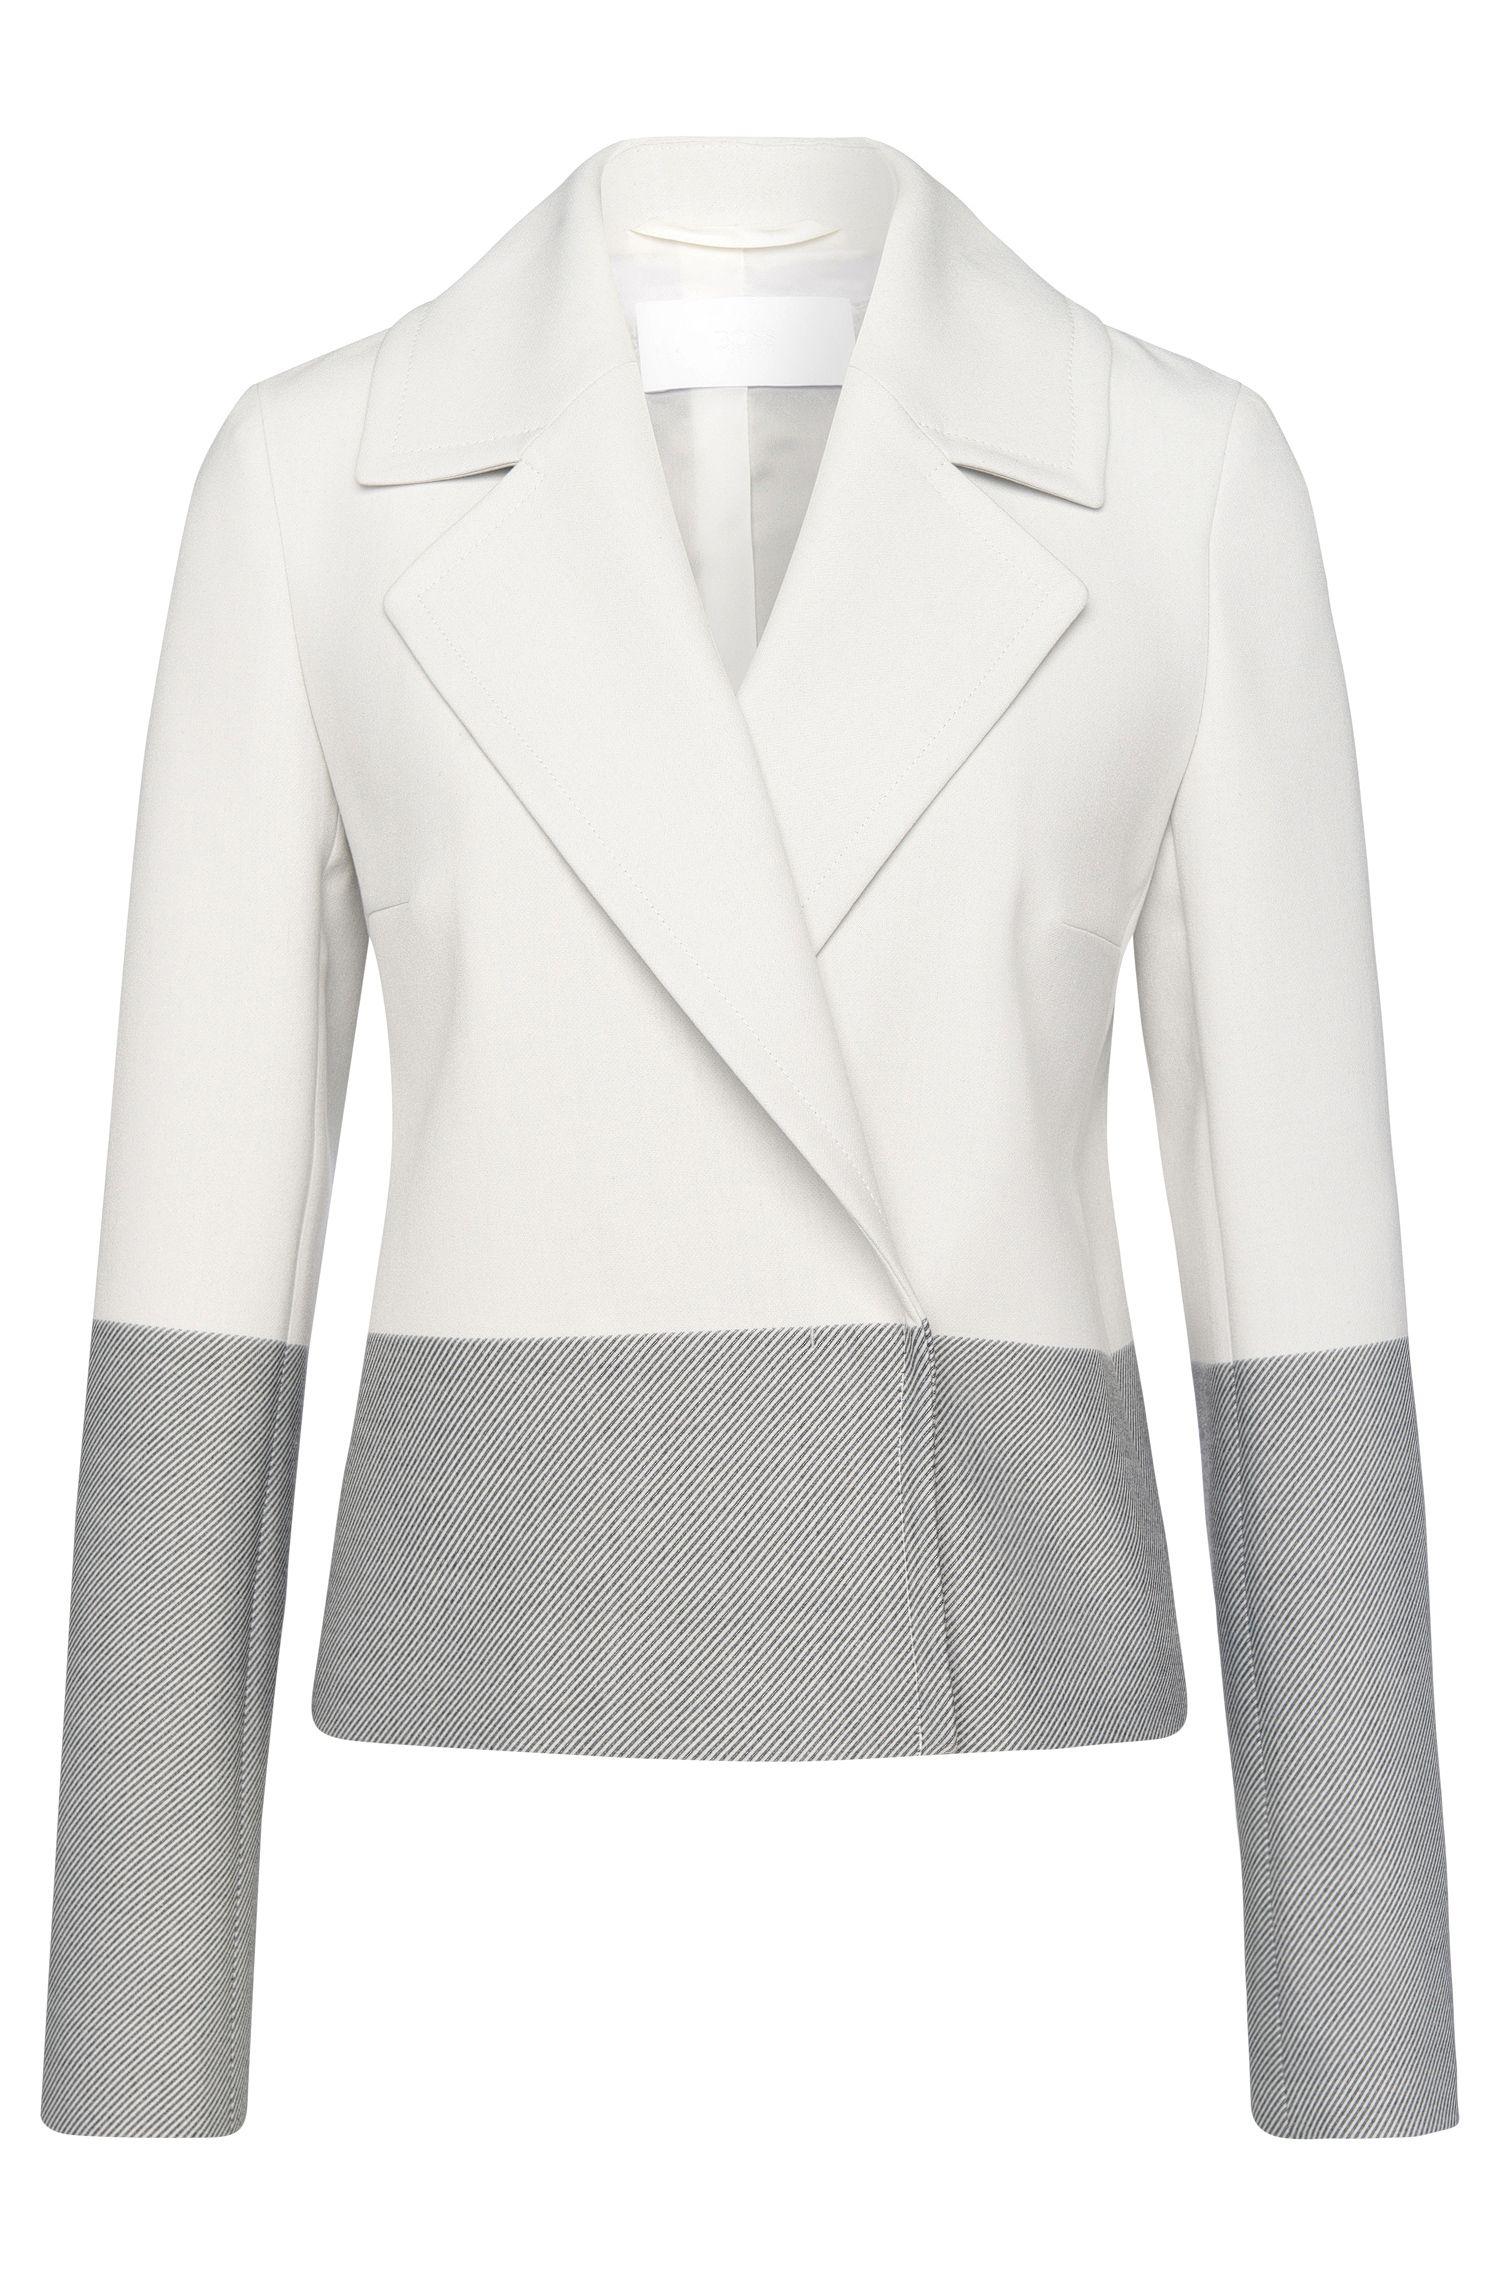 'Kerma' | Stretch Viscose Blend Colorblocked Blazer